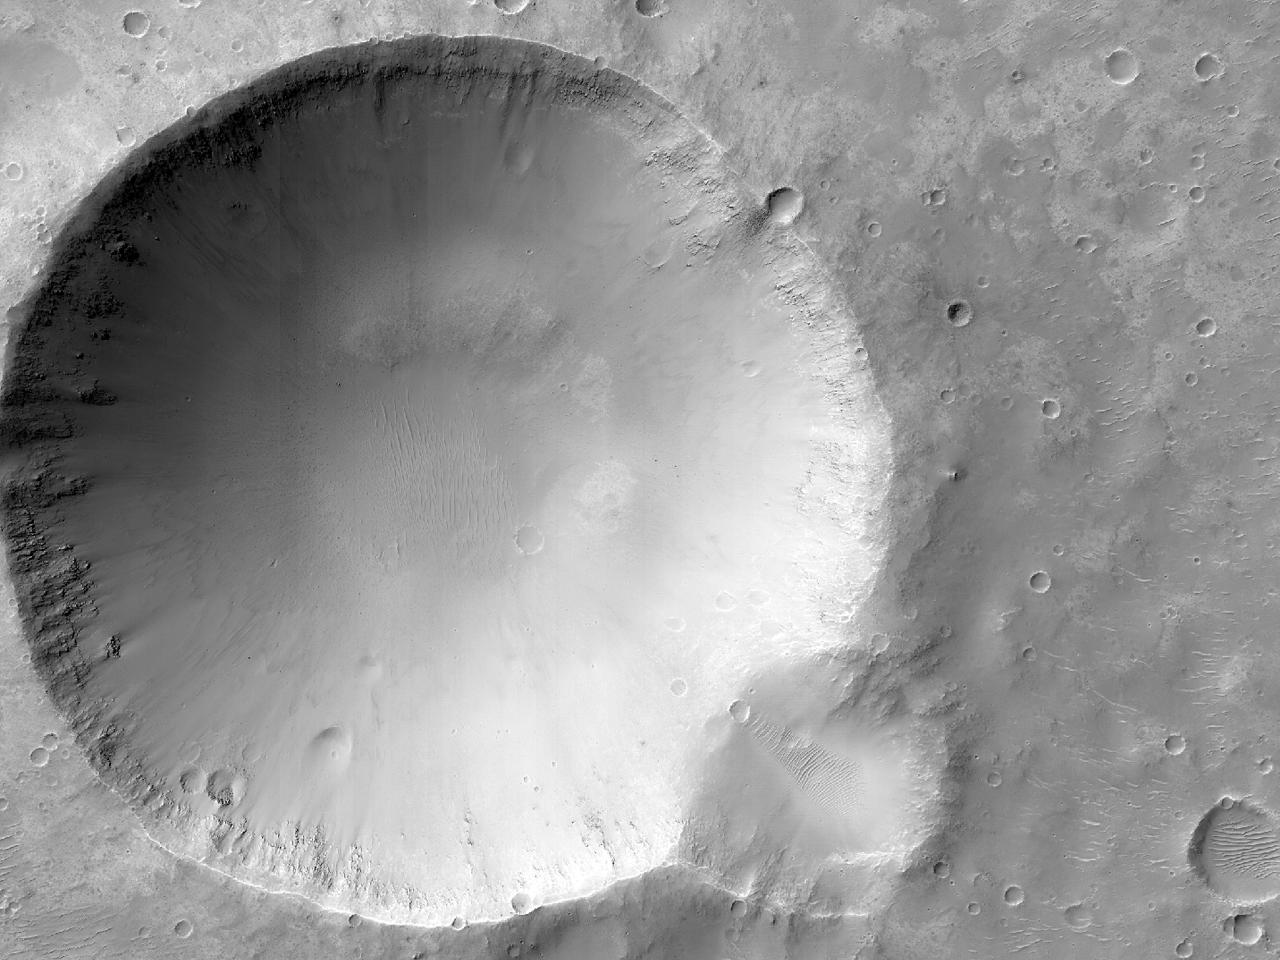 Crateras em Margaritifer Terra